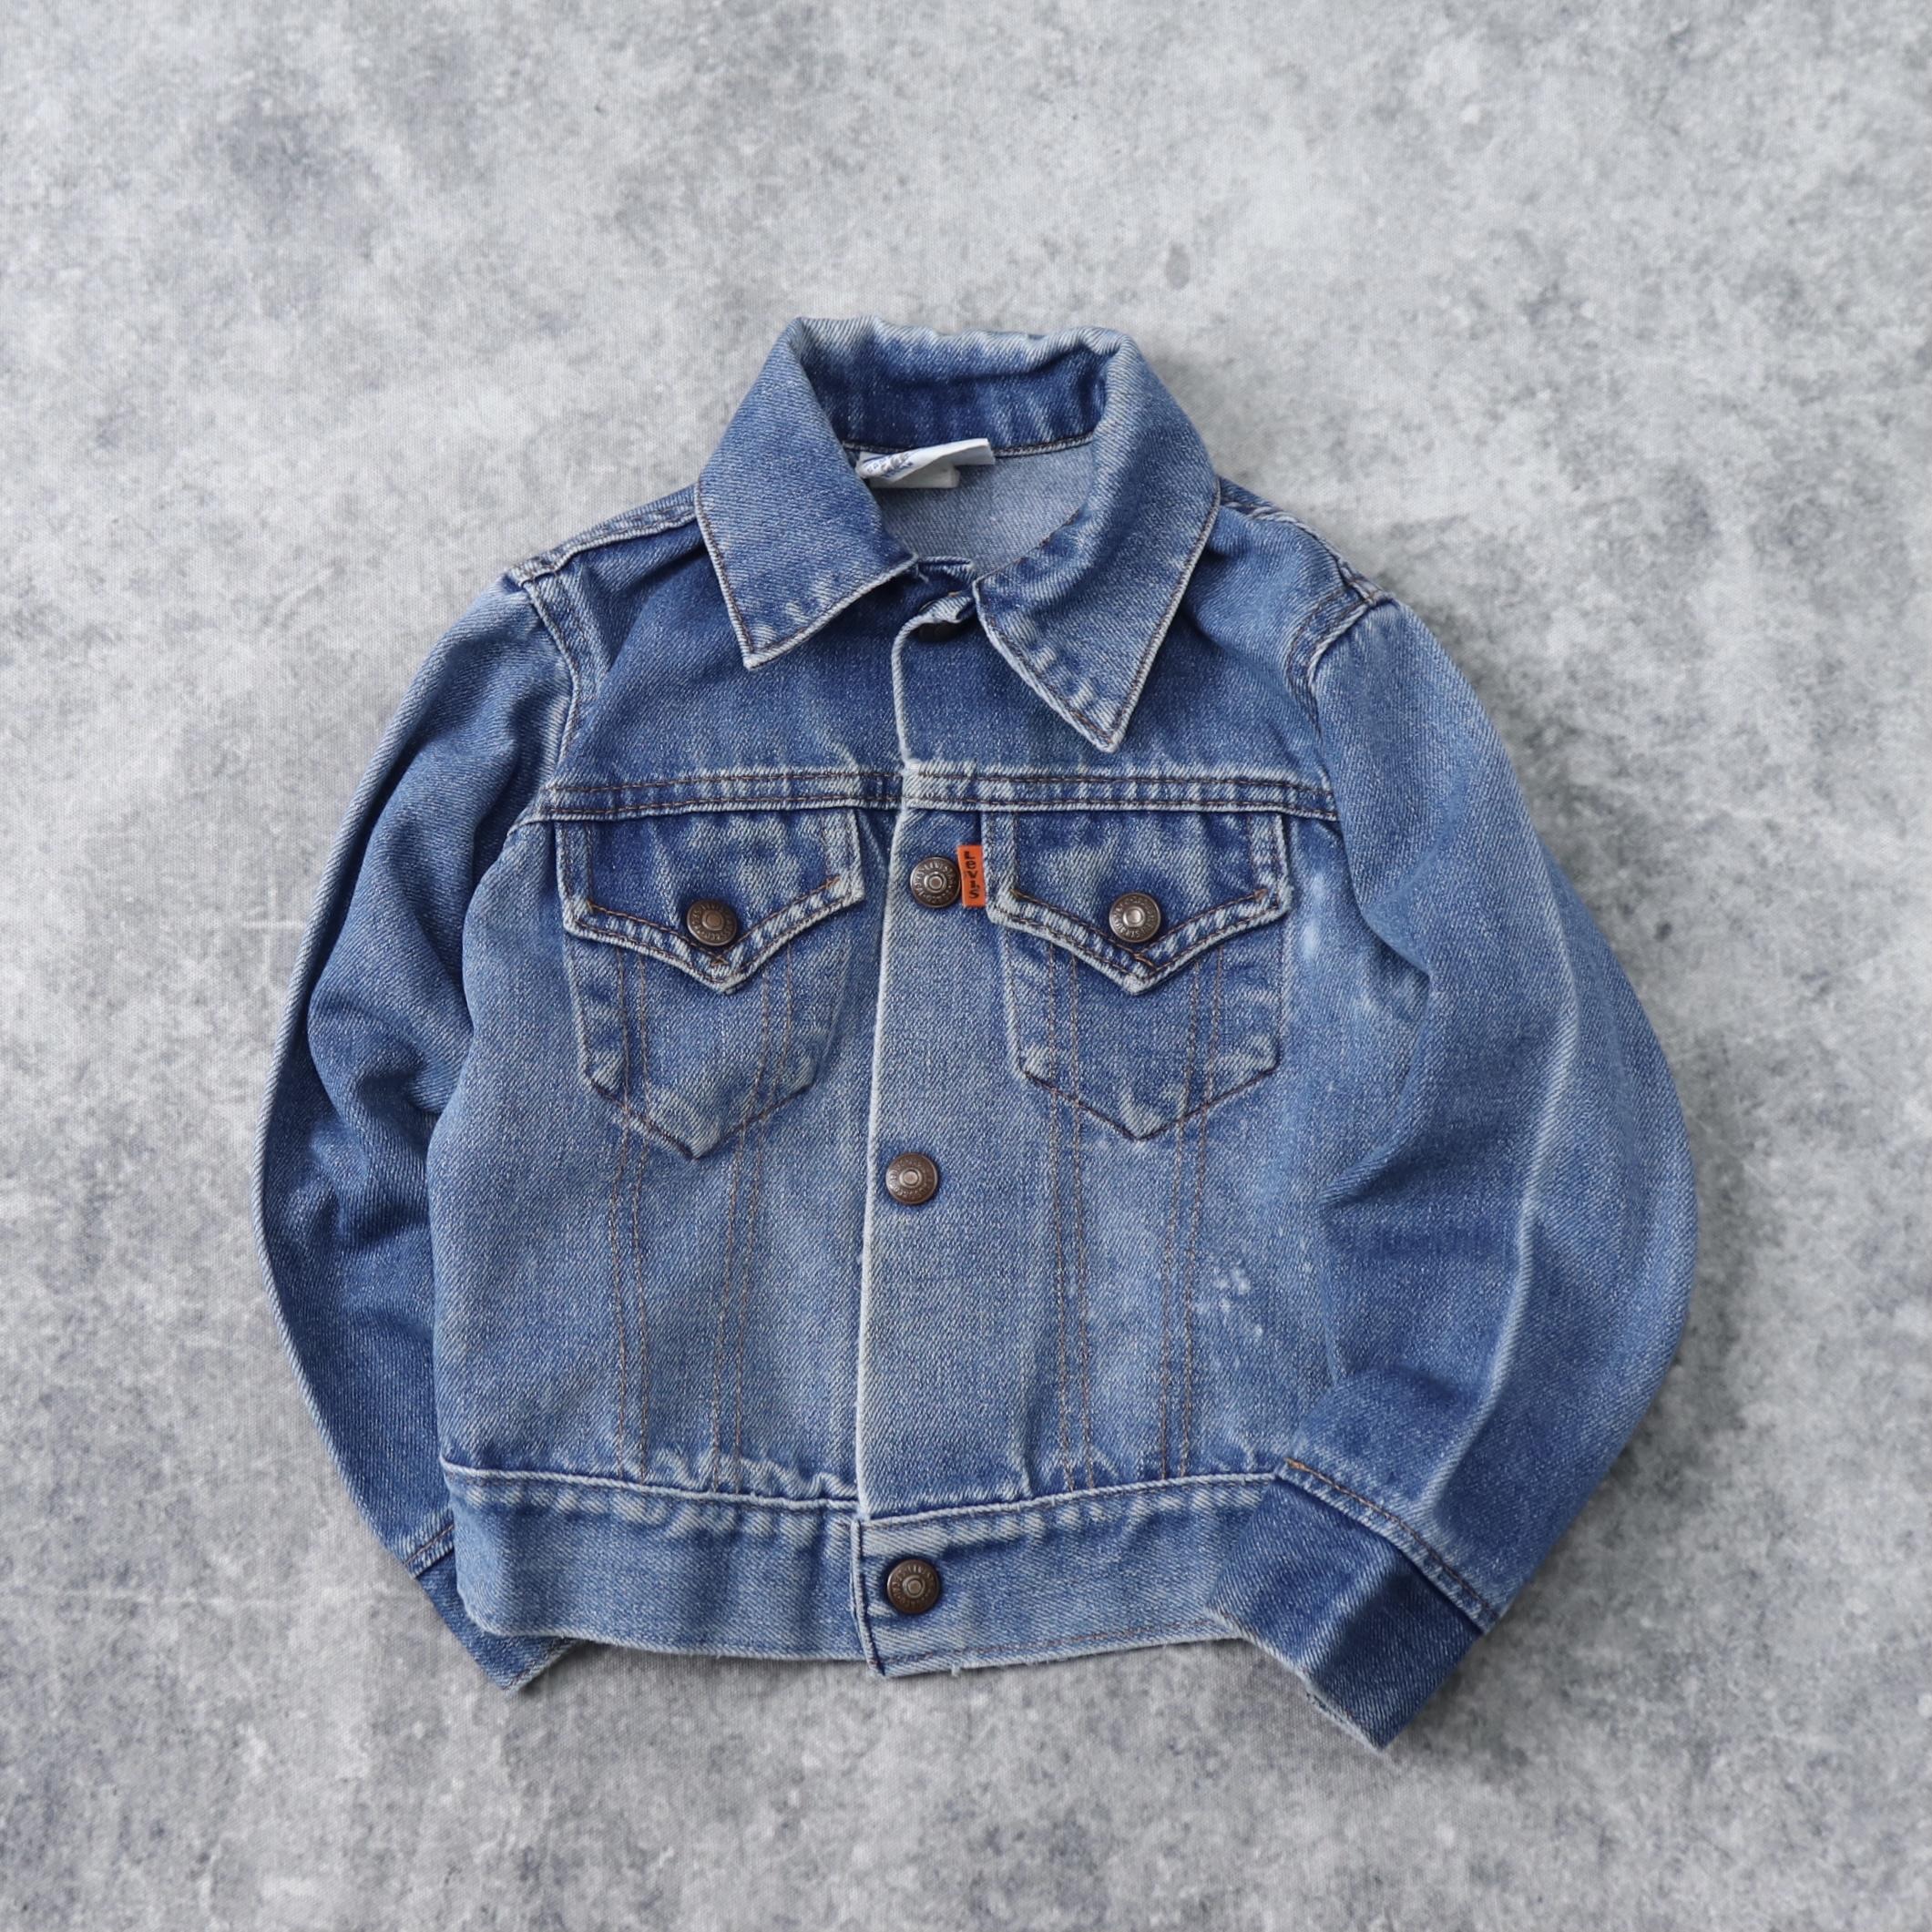 【KIDS】1970s  Vintage  Levi's  Denim  Jacket   A964